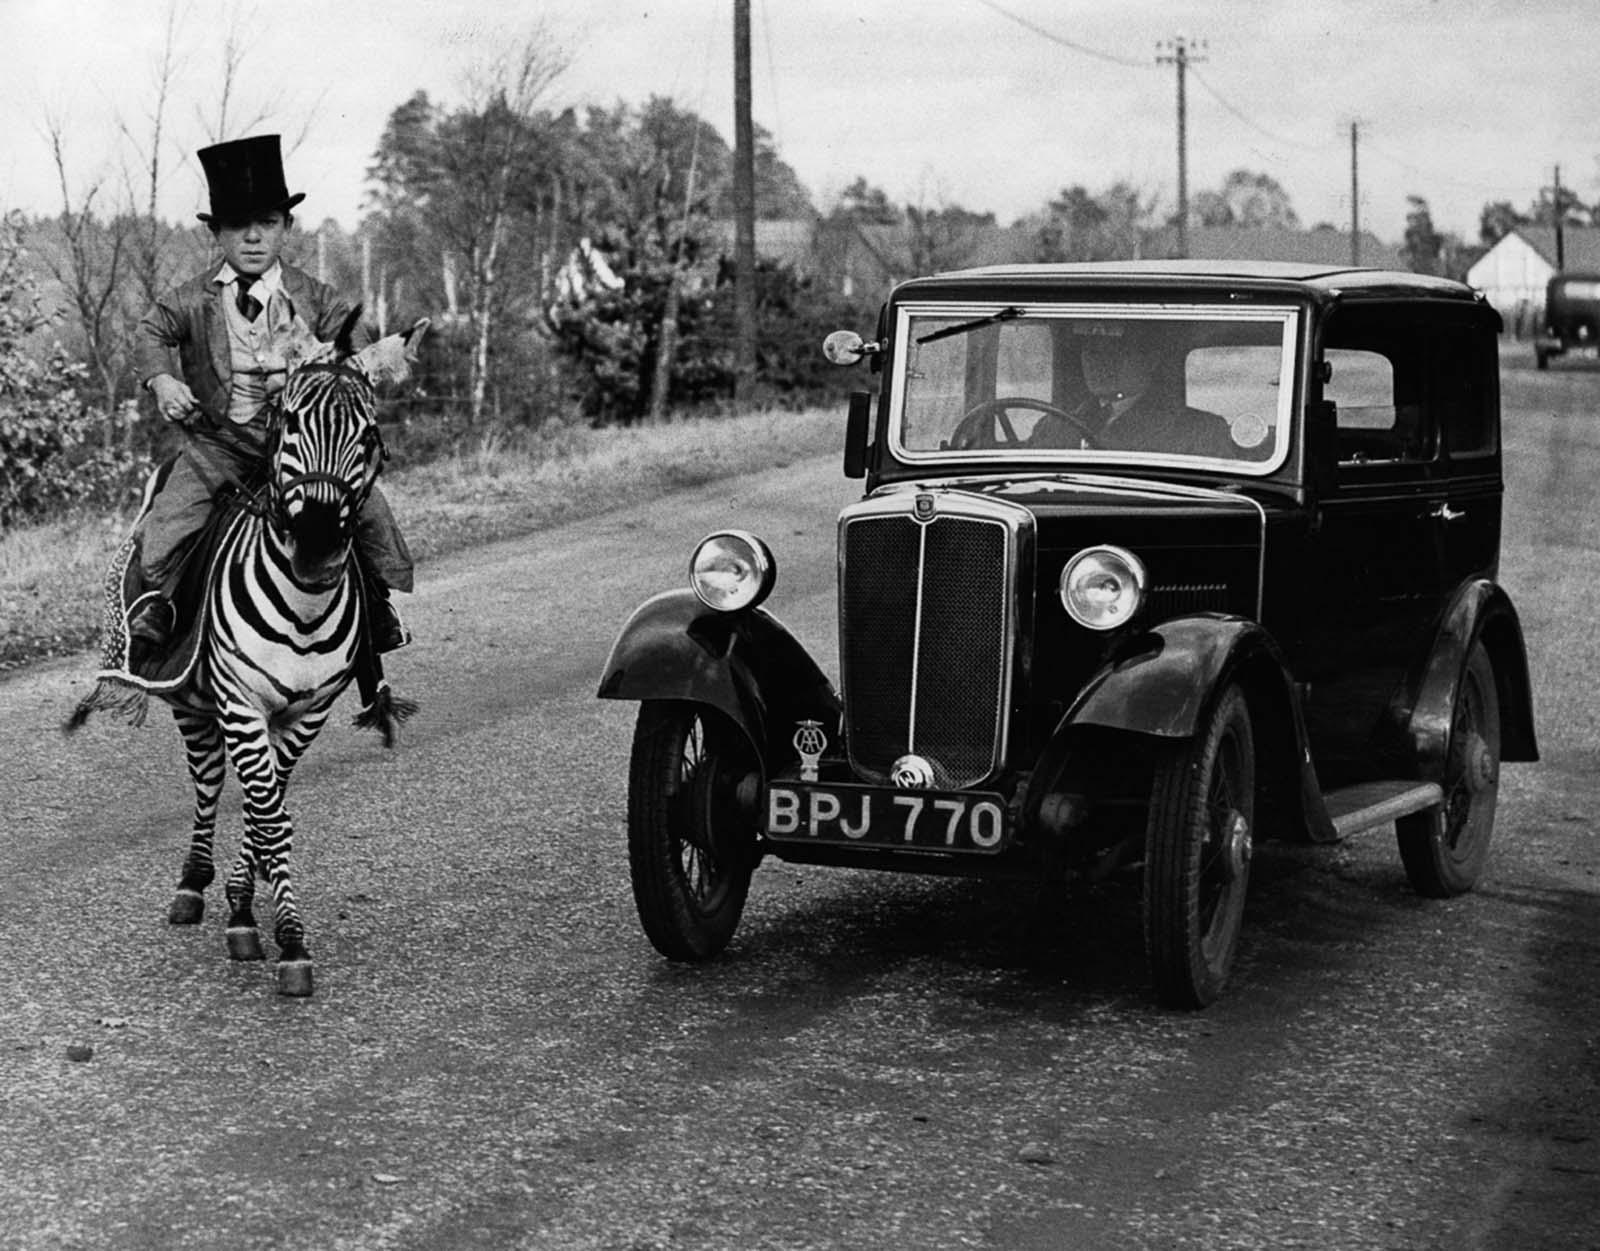 riding zebras photographs